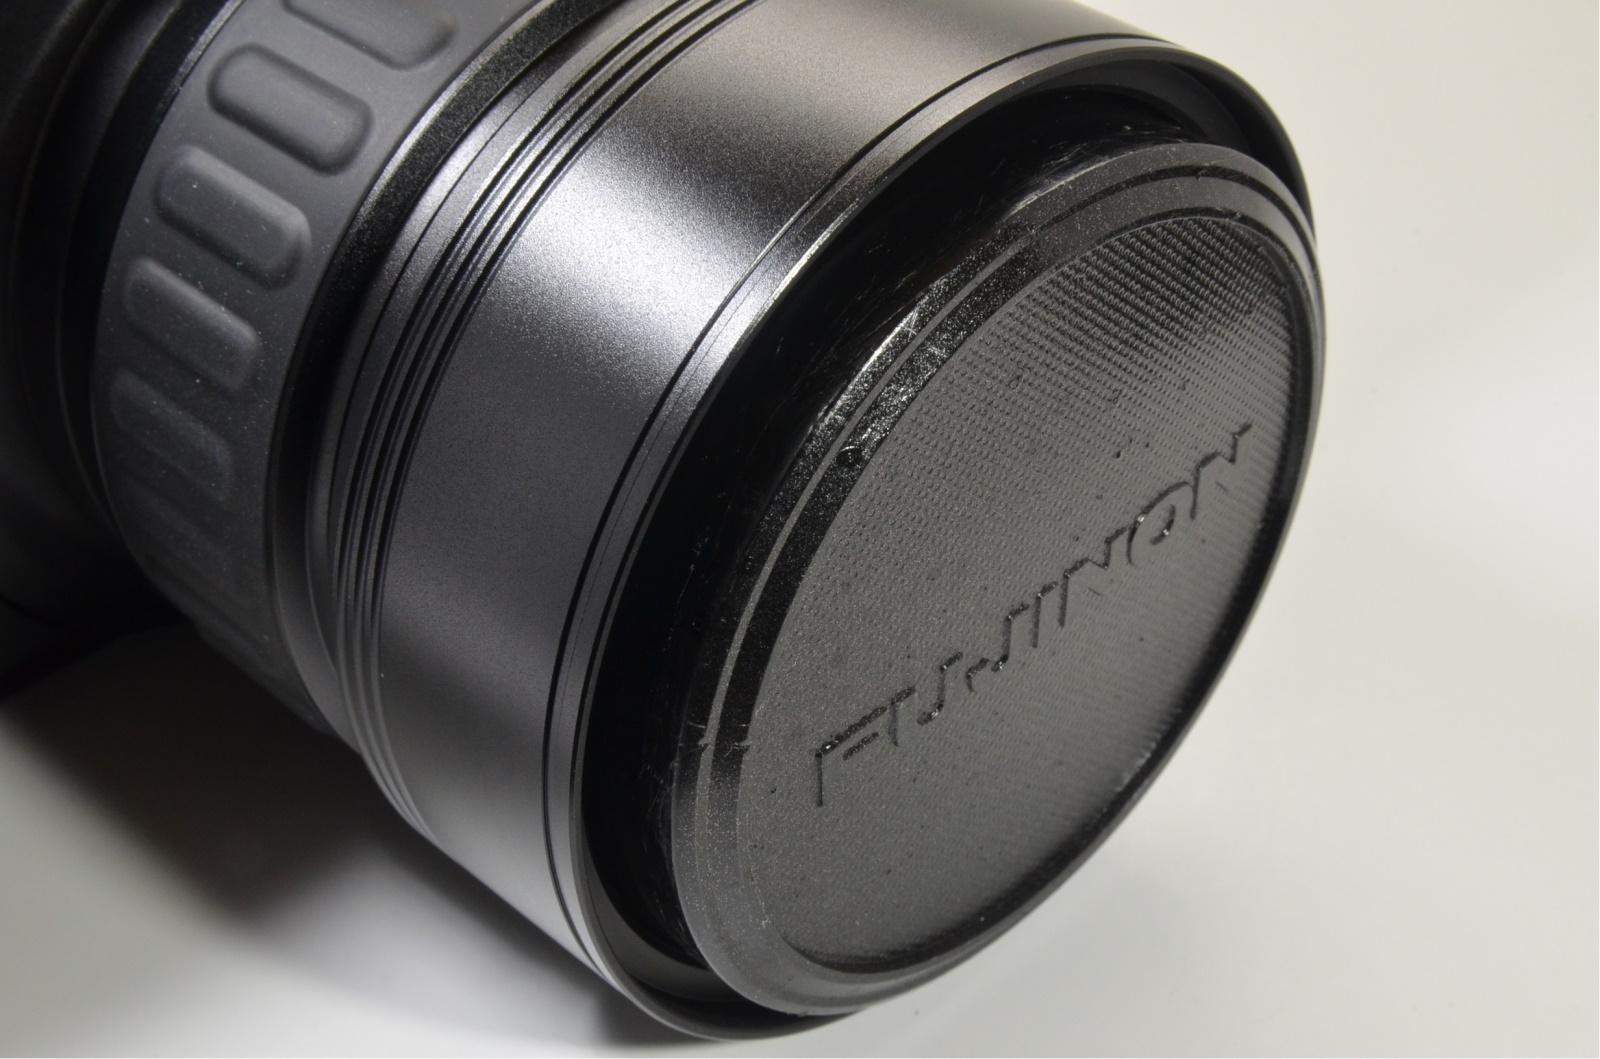 fuji fujifilm gsw690iii 65mm f5.6 count 016 medium format camera shooting tested